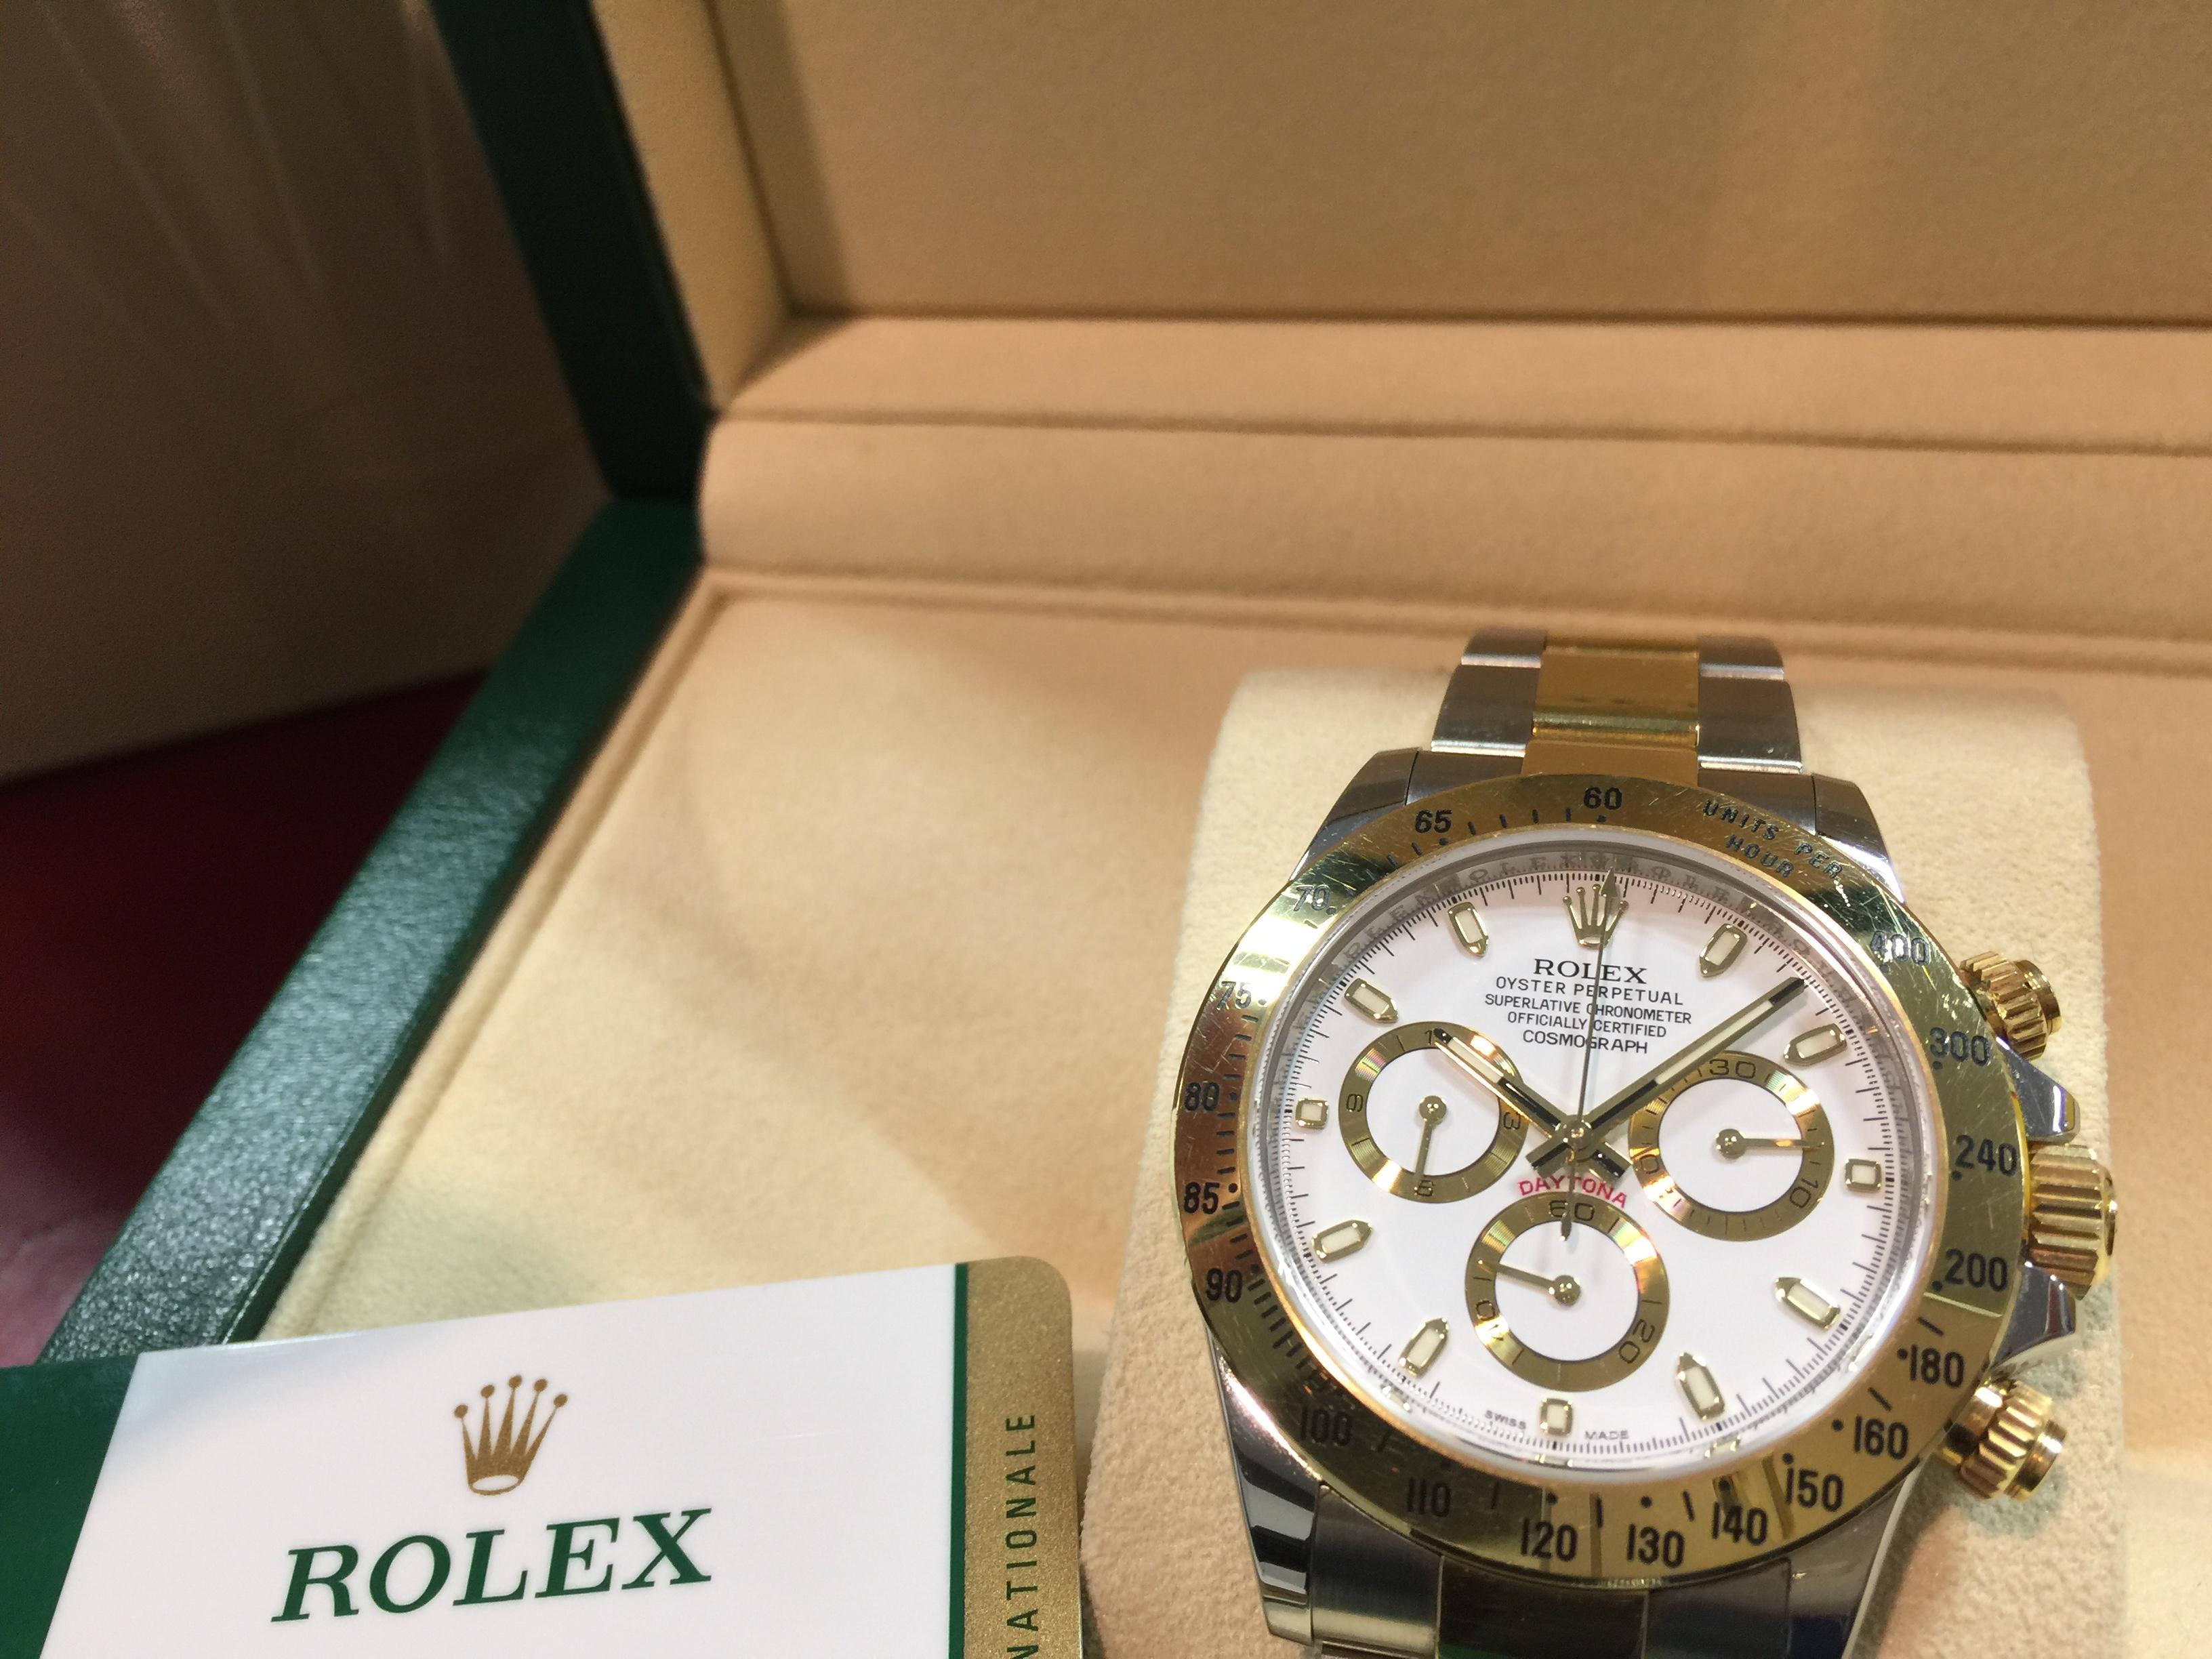 separation shoes 2ffdc 655da ロレックス ROLEX デイトナ 116523 ランダム | 時計の高価買取 ...